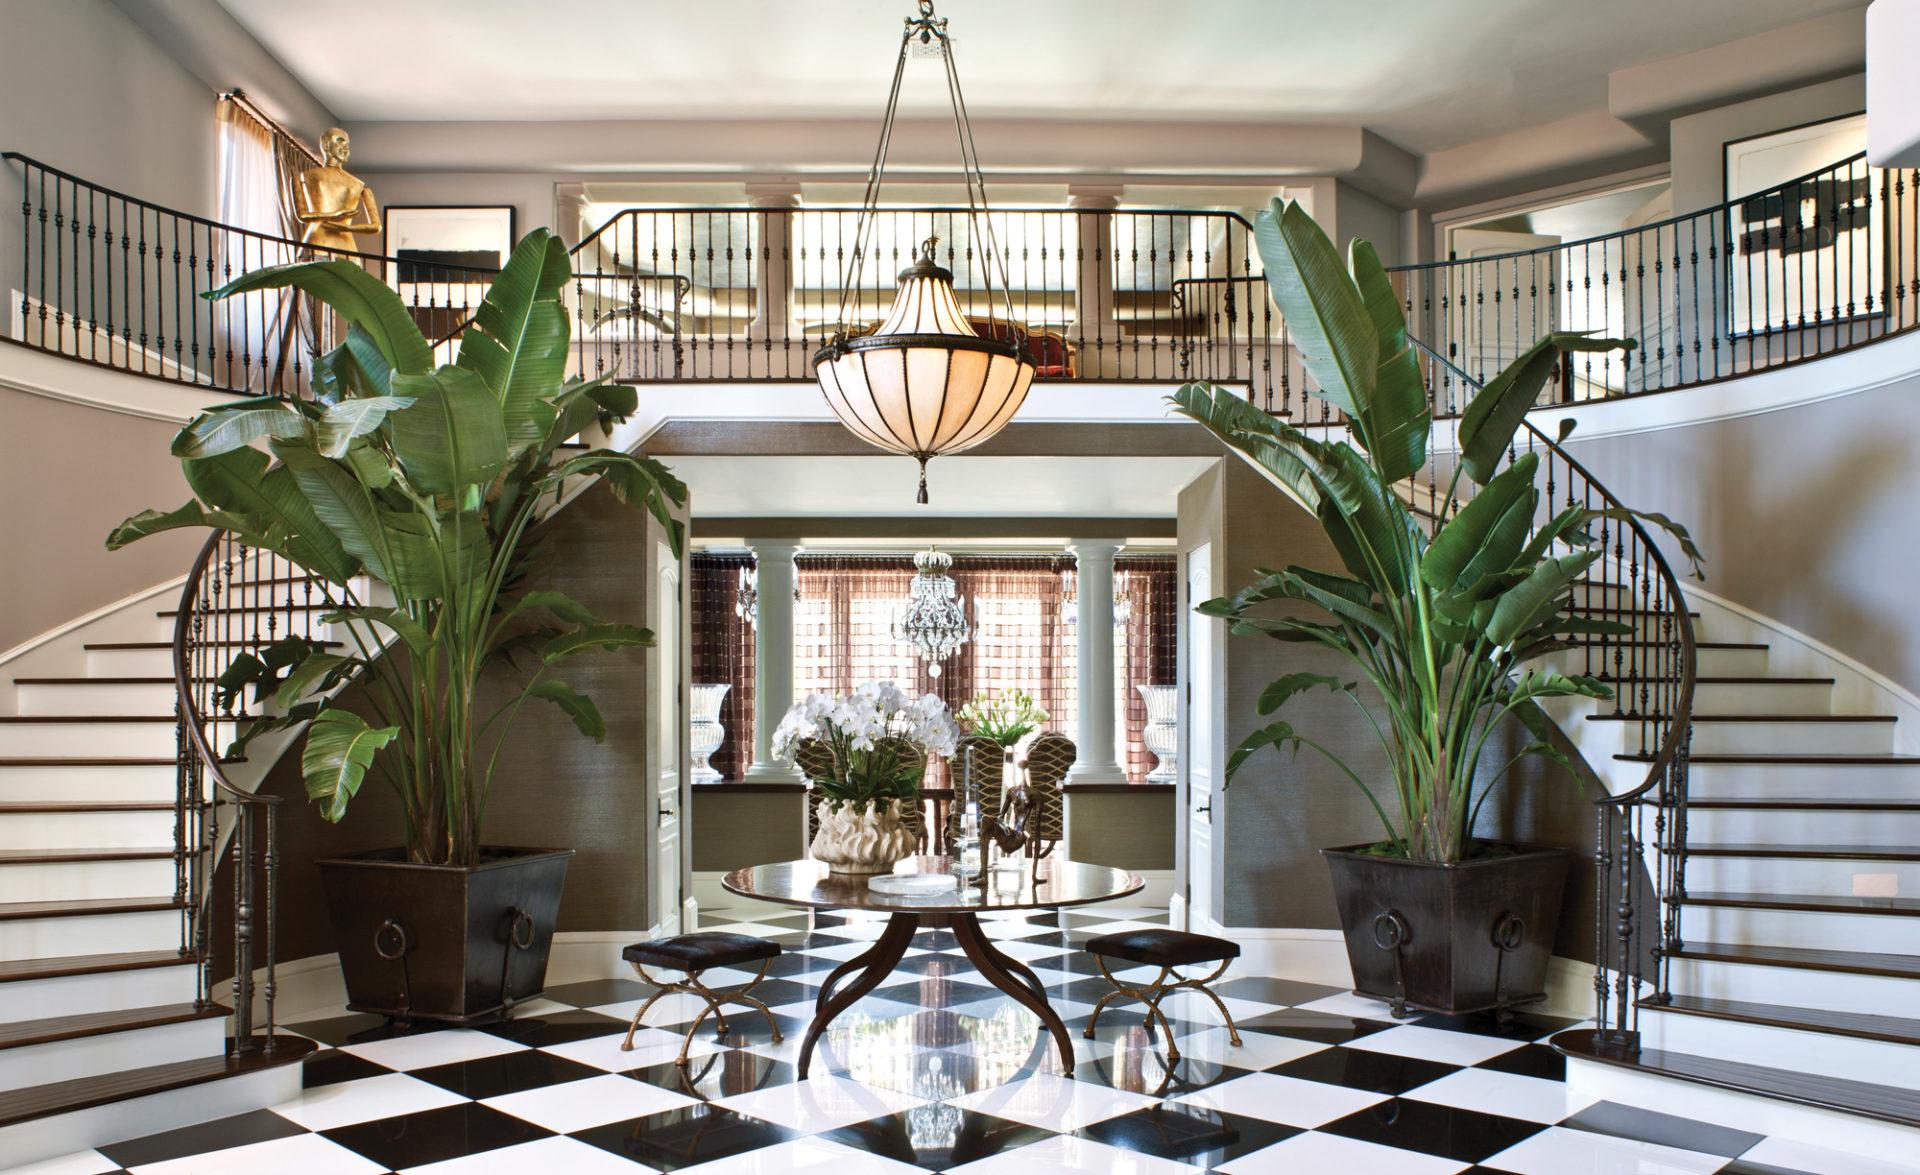 Kris Jenner Bedroom Decor Jeff Andrews Designs For Kris Jenner In California Interiors